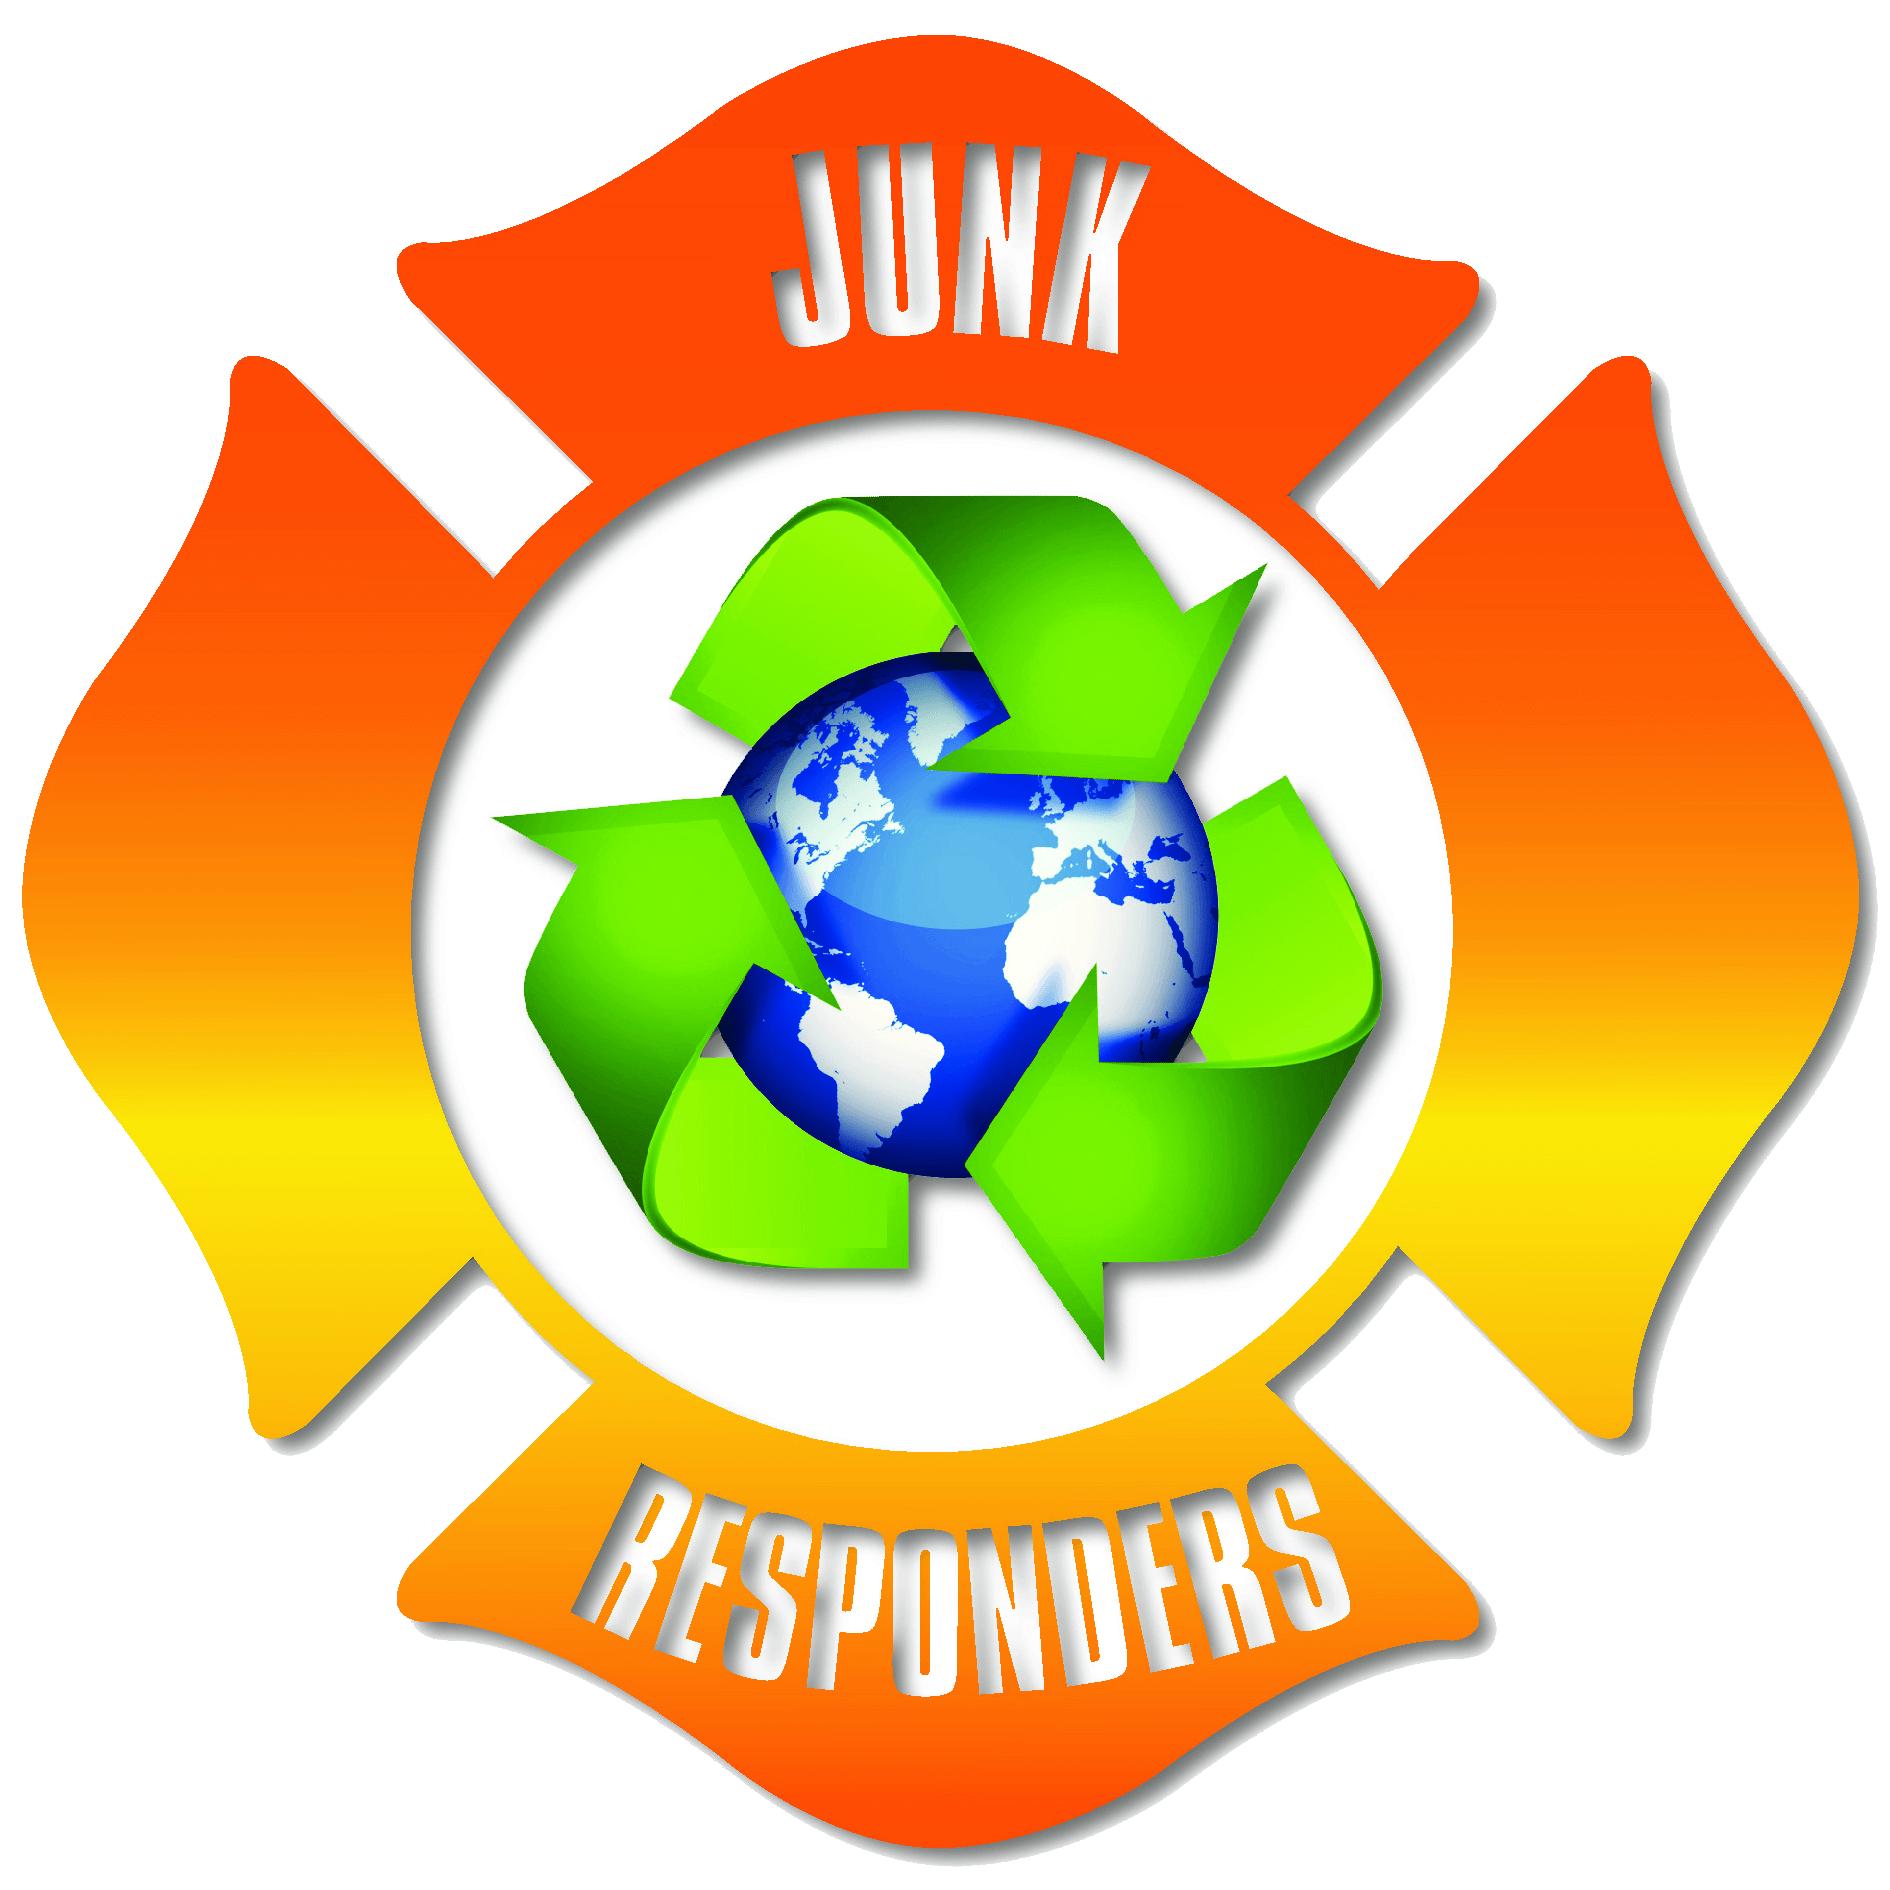 Junk Responders Junk Removal Service